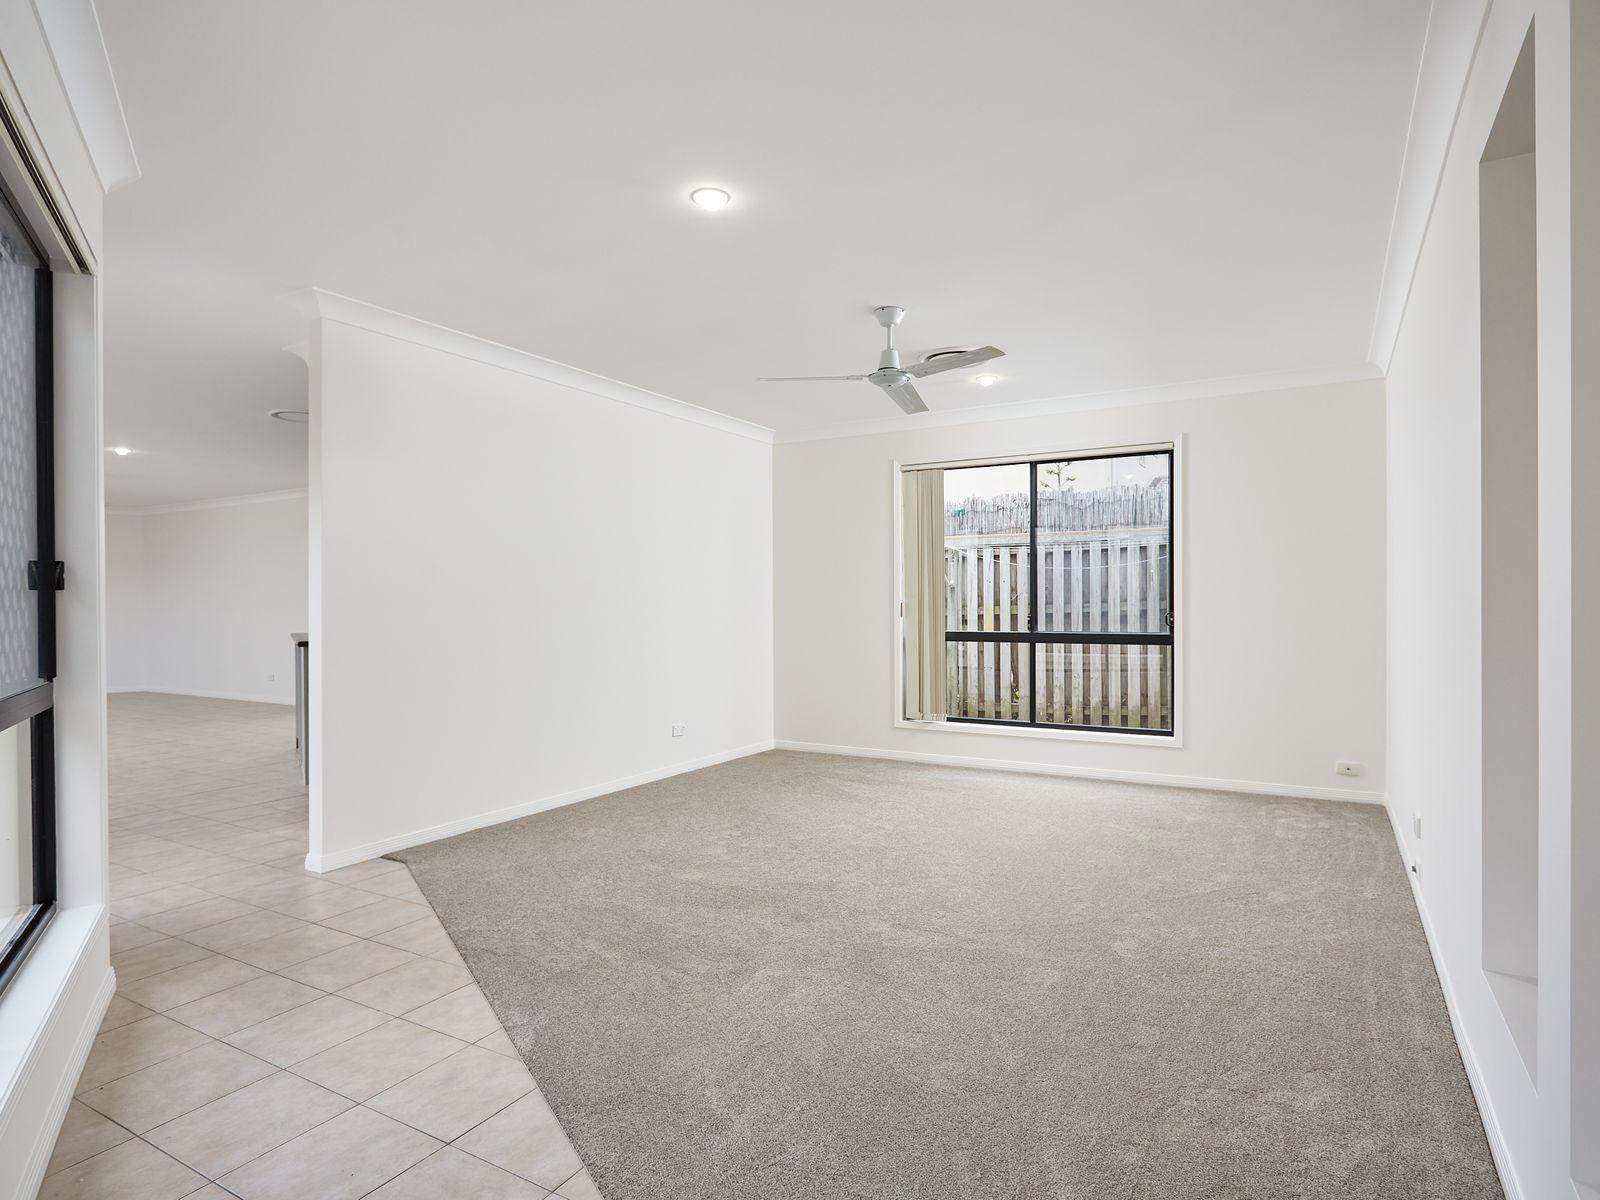 3 Arragan Court, Pacific Pines, QLD 4211